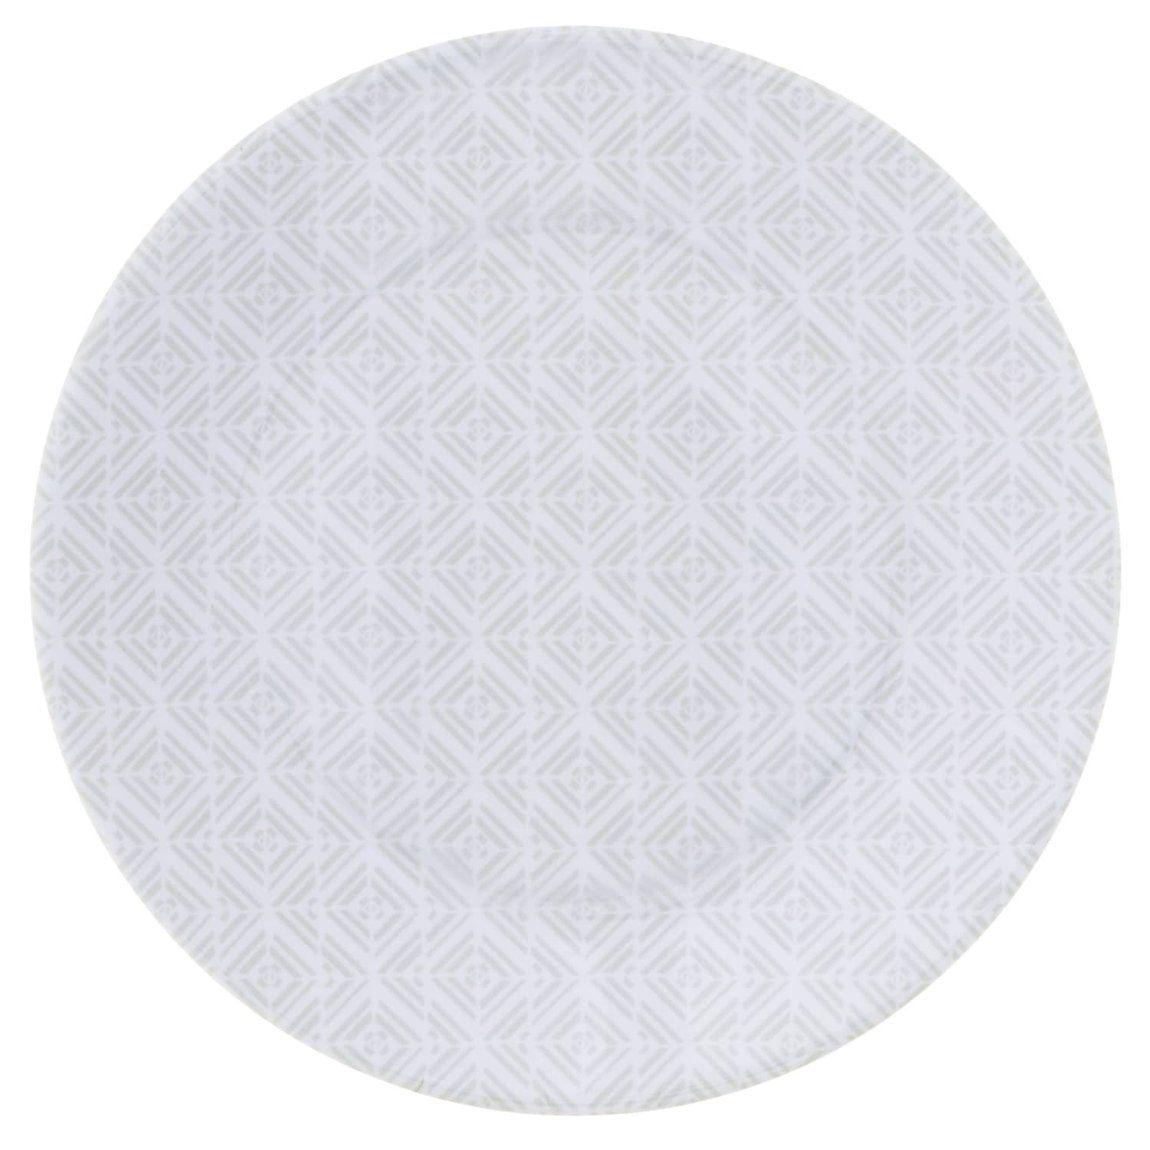 Boho Picnic Plate Grey Picnic Essentials B M Stores In